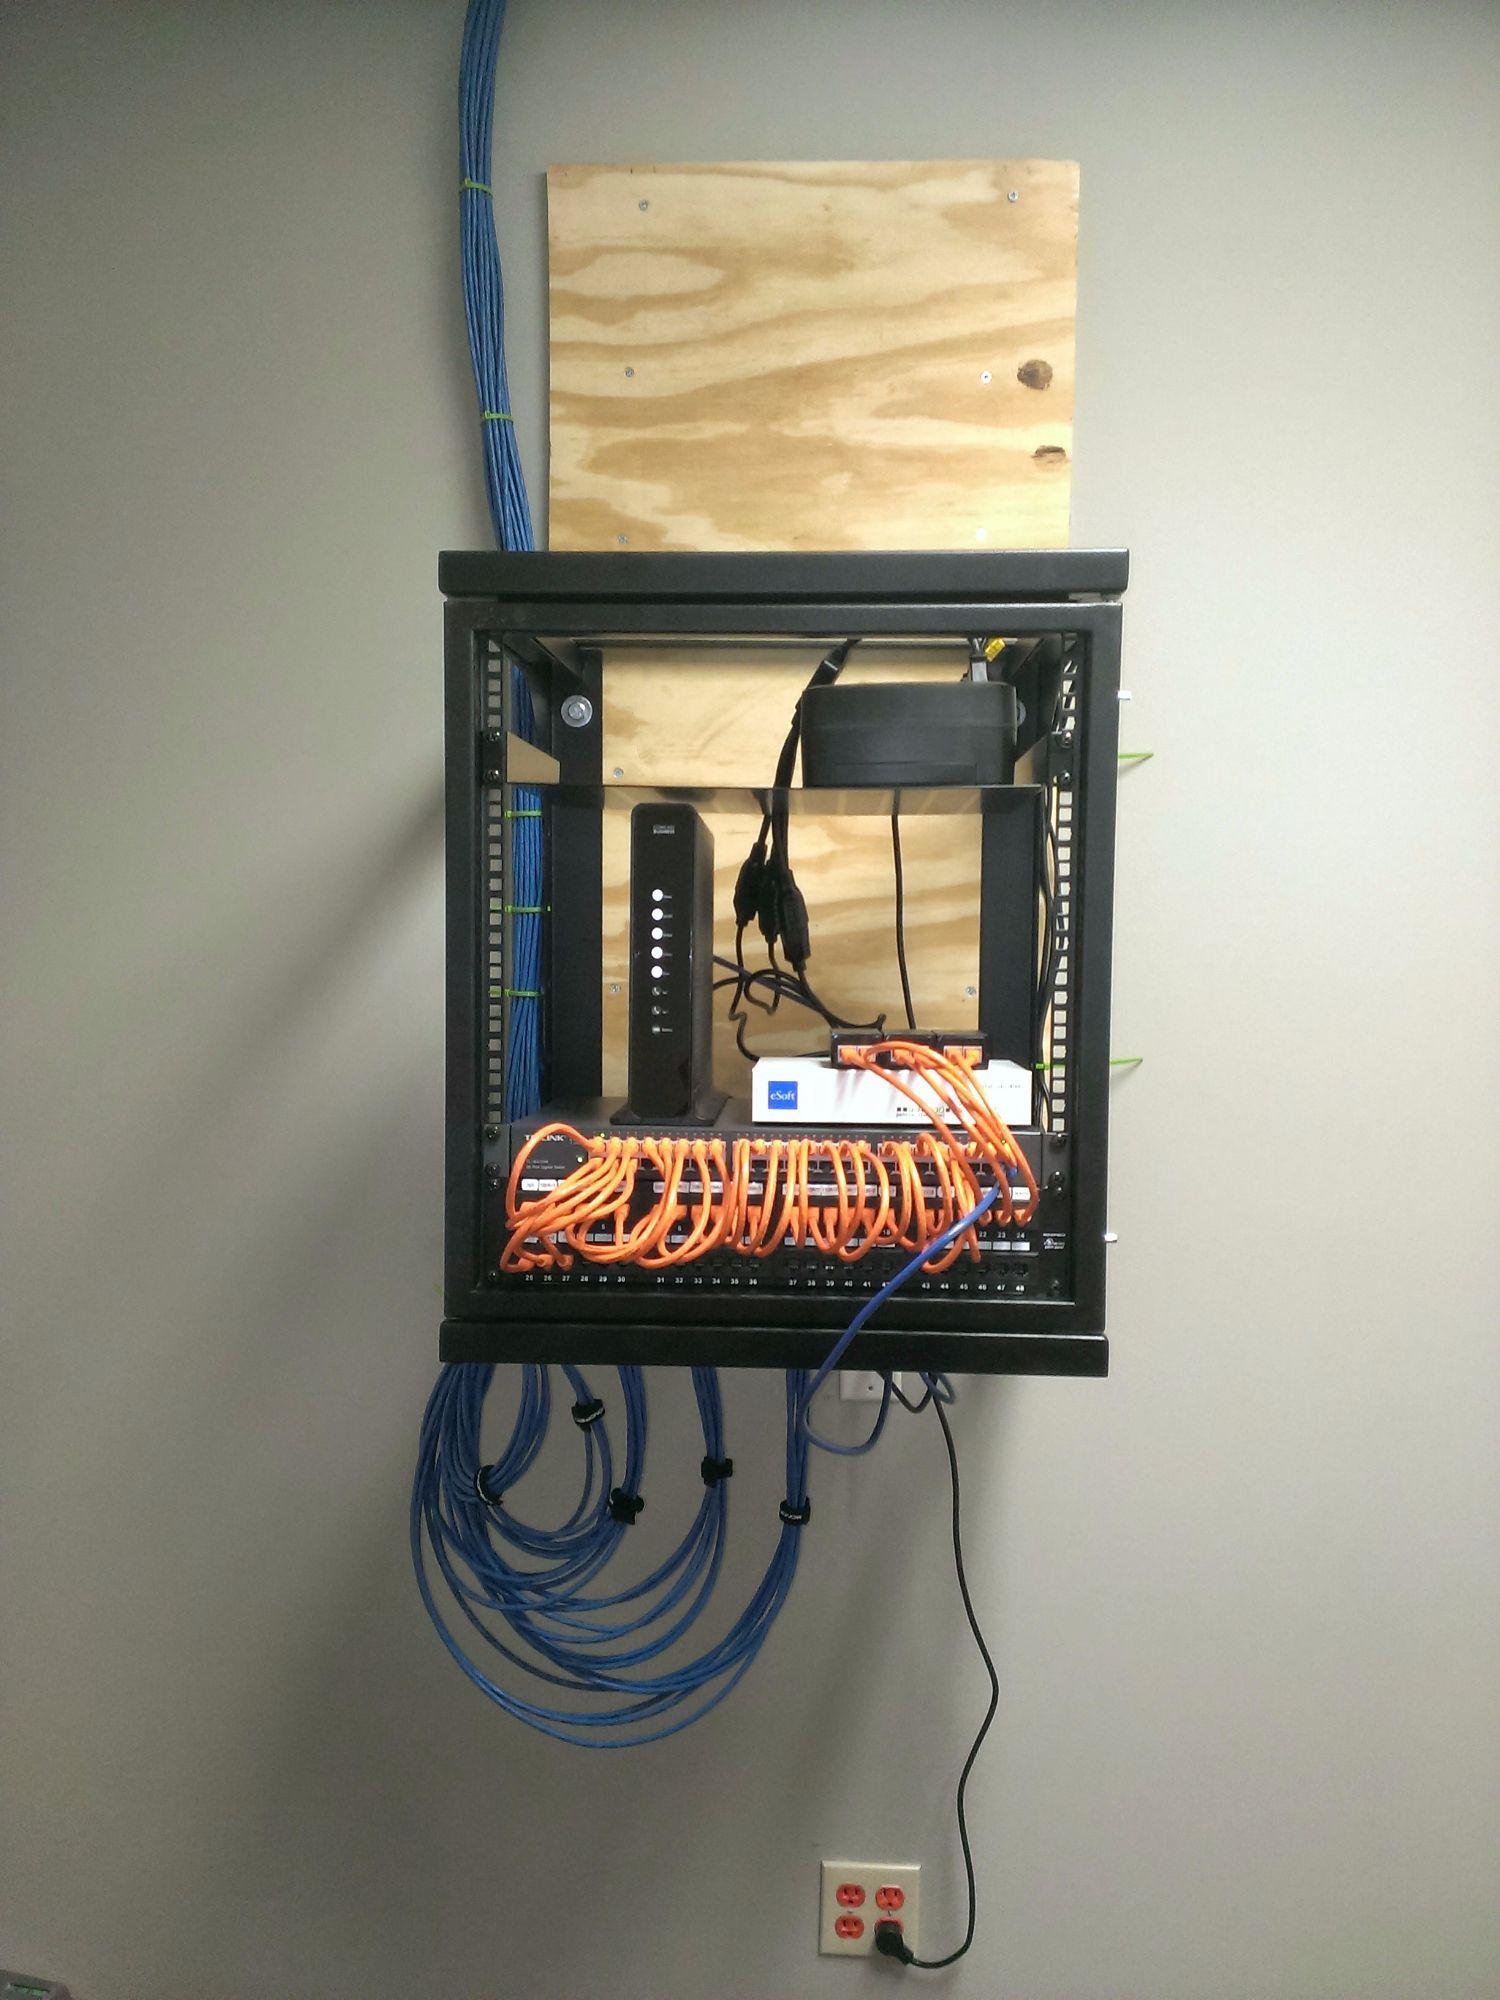 568a Vs 568b Wiring Standards